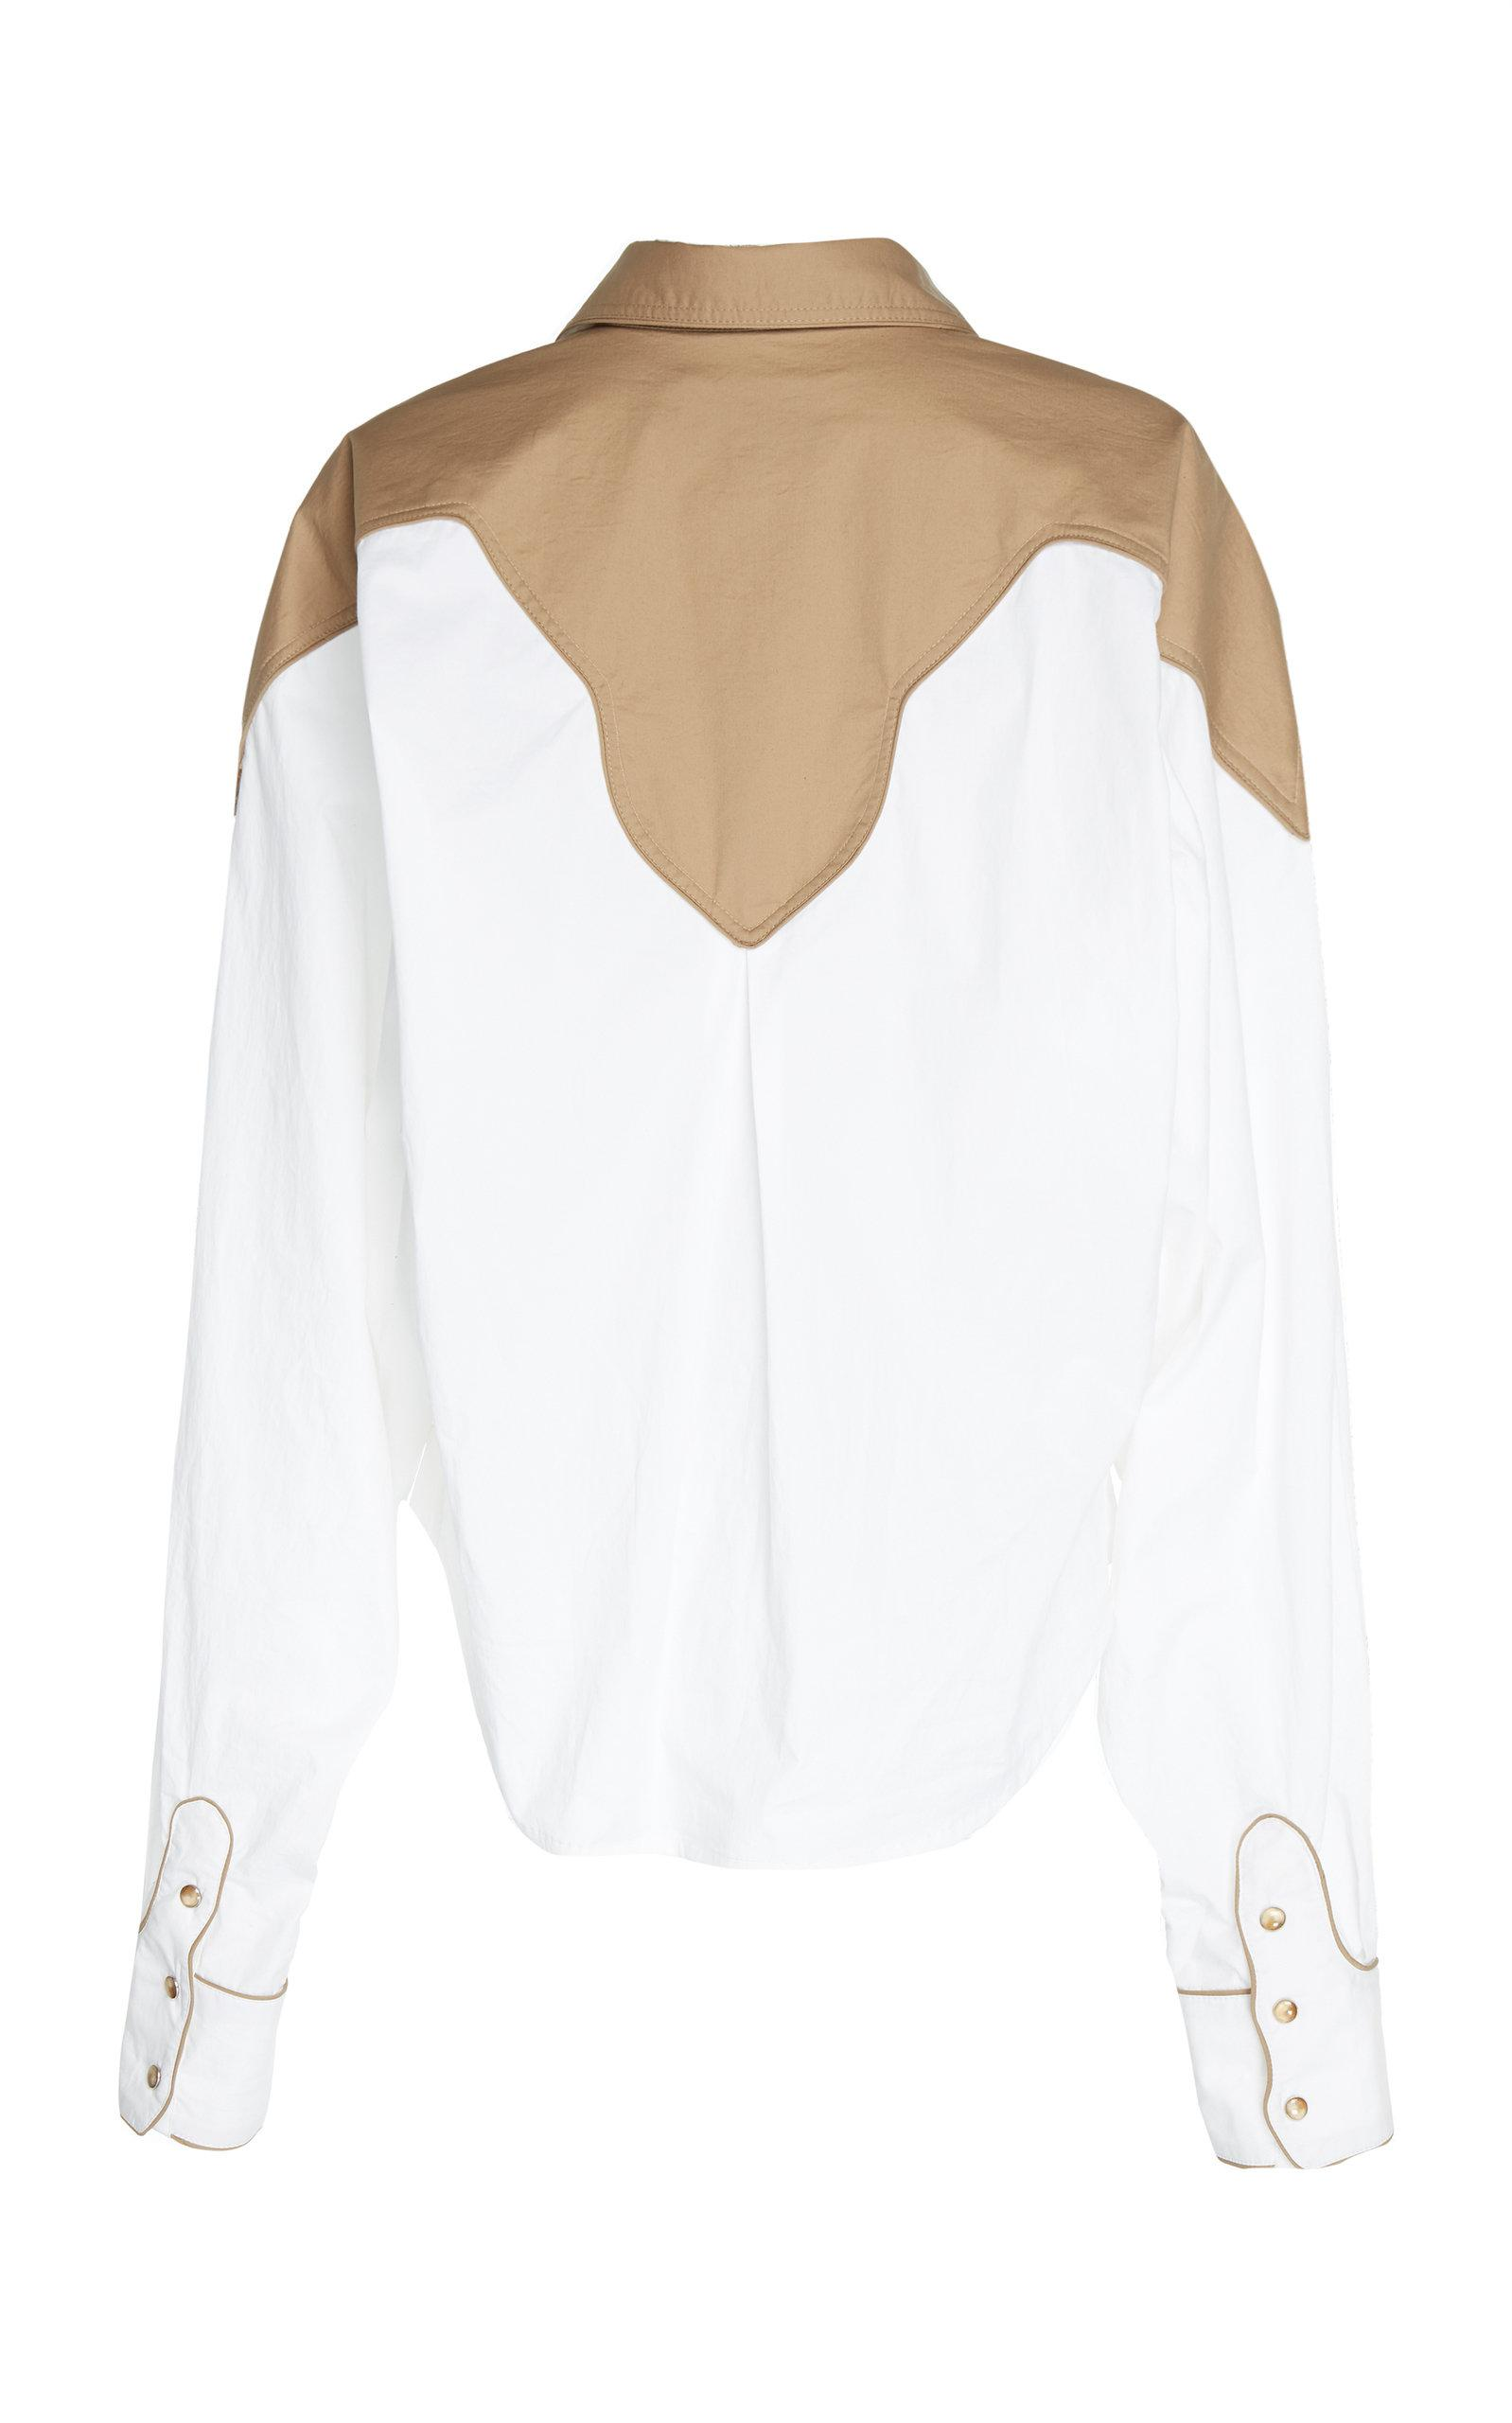 Buy Cheap Very Cheap Deals Cheap Price Stretch Cotton Poplin Mapale Shirt Johanna Ortiz Factory Outlet Cheap Price Outlet Classic Cheap Sale Huge Surprise 9ocG6Ox